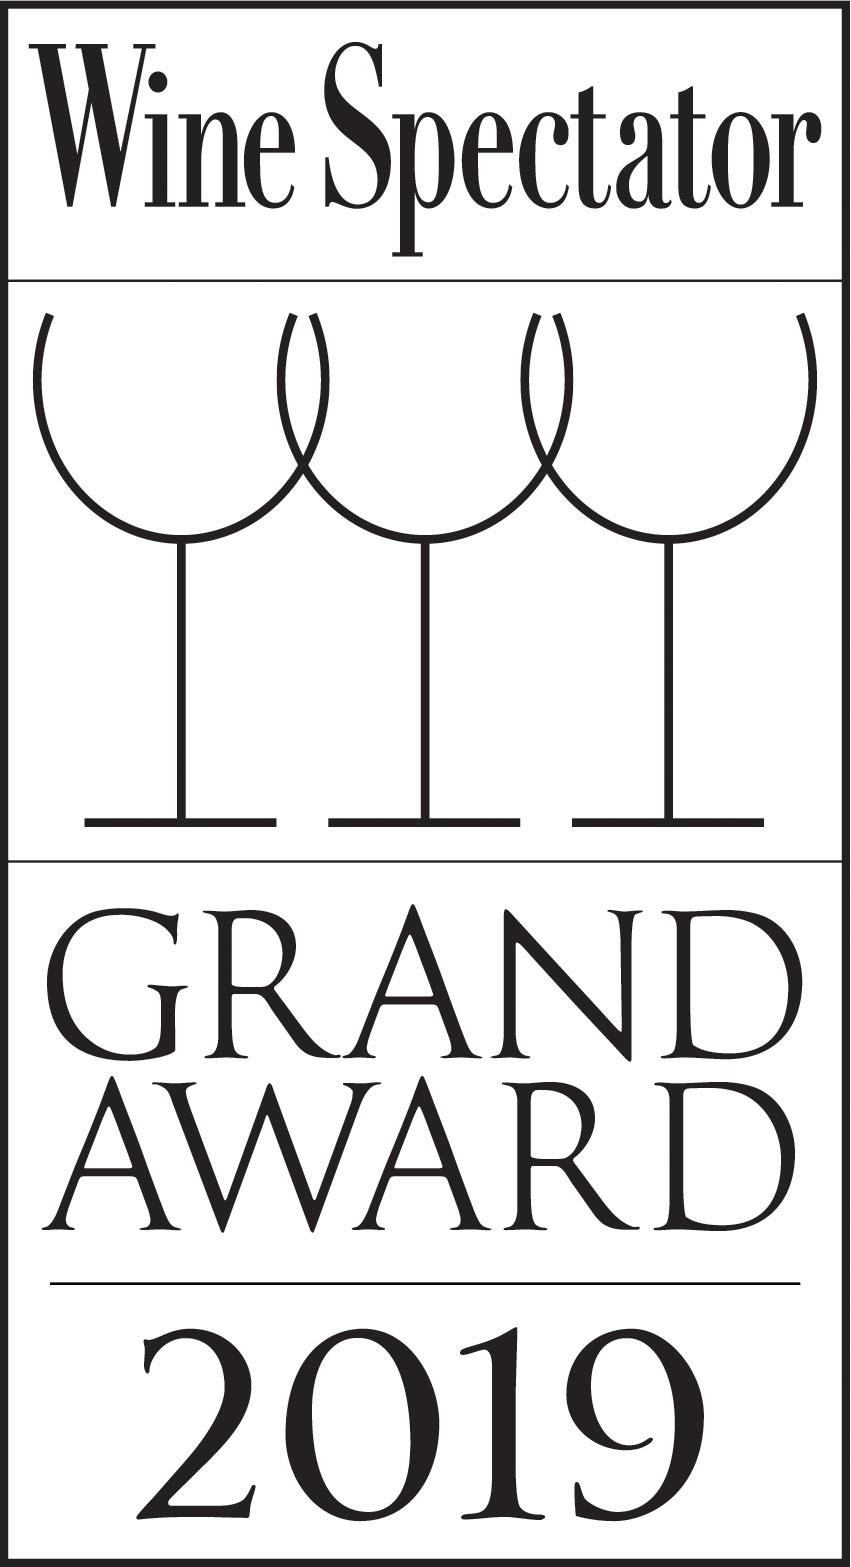 Wine Spectator 2019 Grand Award